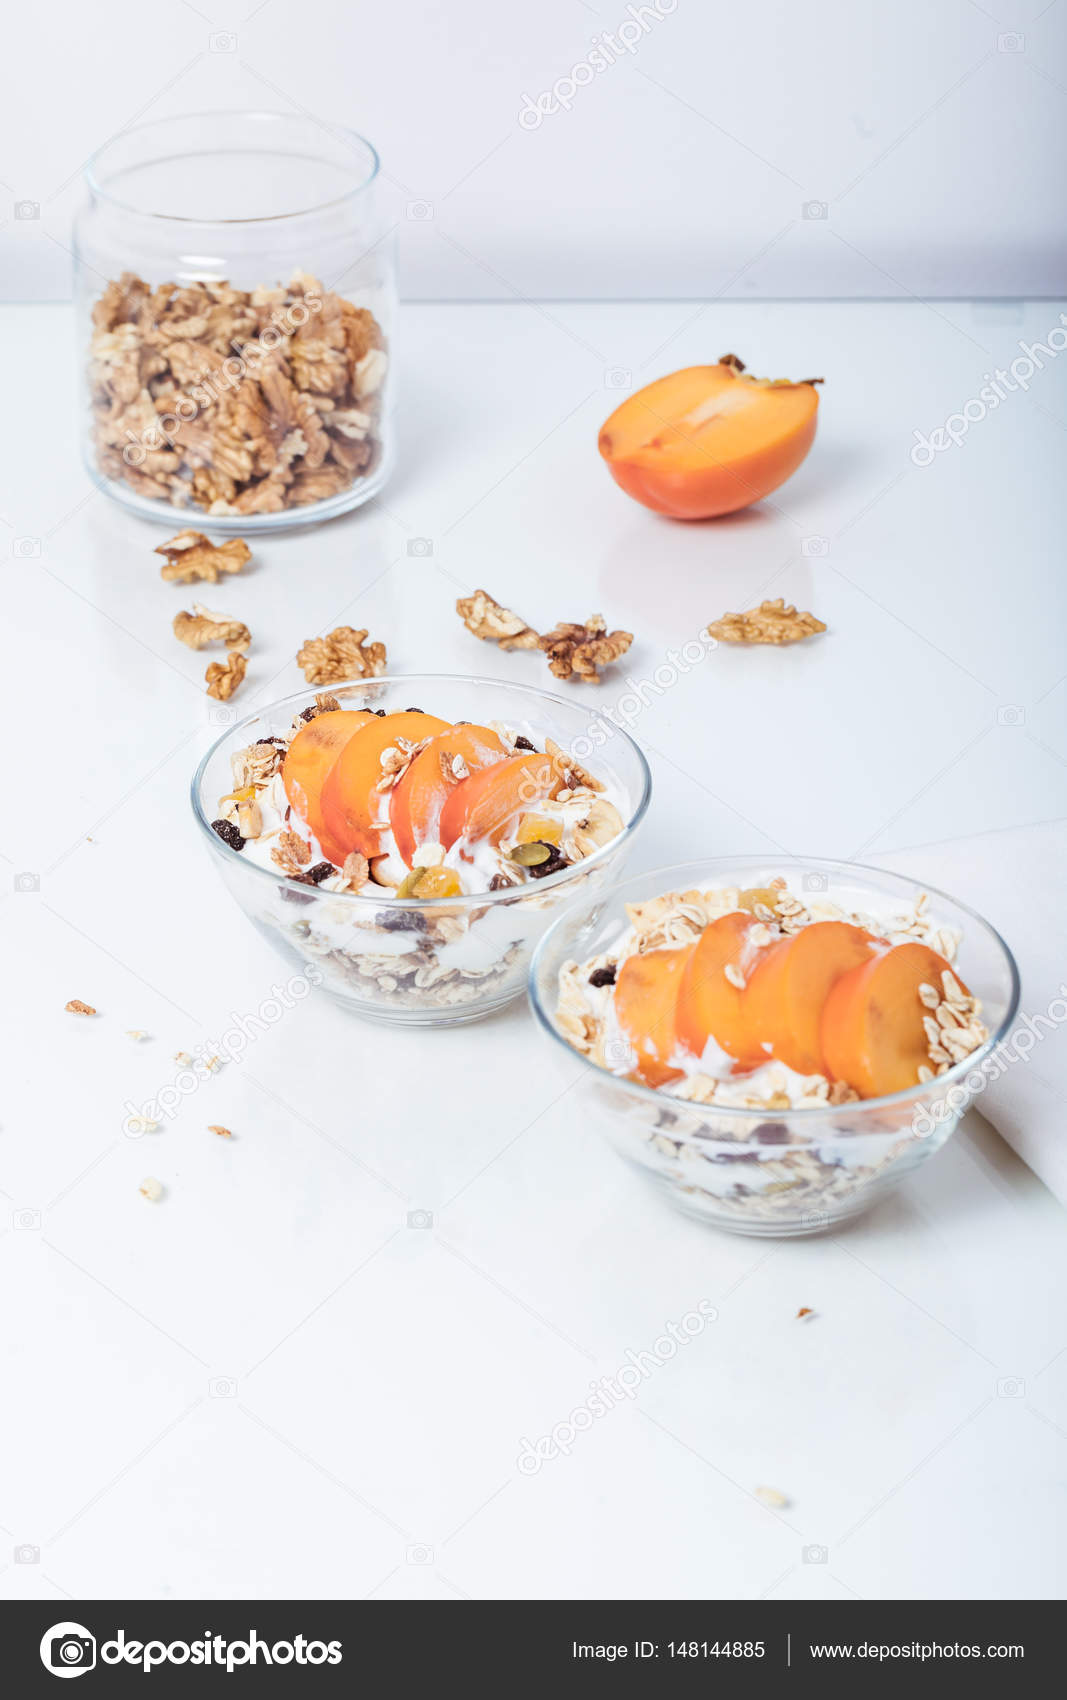 Homemade granola with soy yogurt stock photo creativephotocorner homemade vegan granola cereal with soy yogurt walnuts blueberry and almond milk photo by creativephotocorner ccuart Image collections